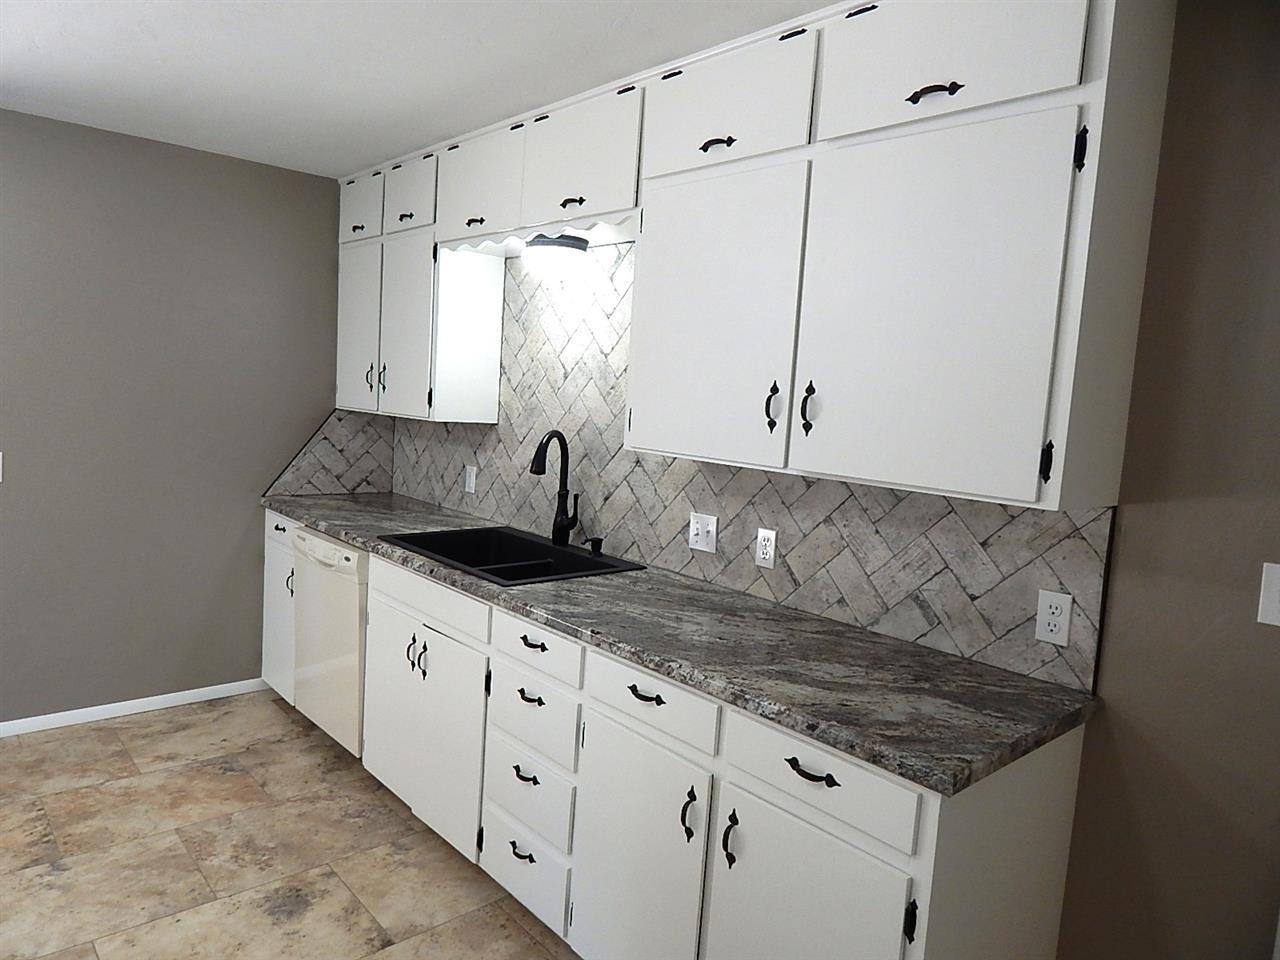 Sold Cross Sale W/ MLS | 1604 Blackard Ponca City, OK 74604 7